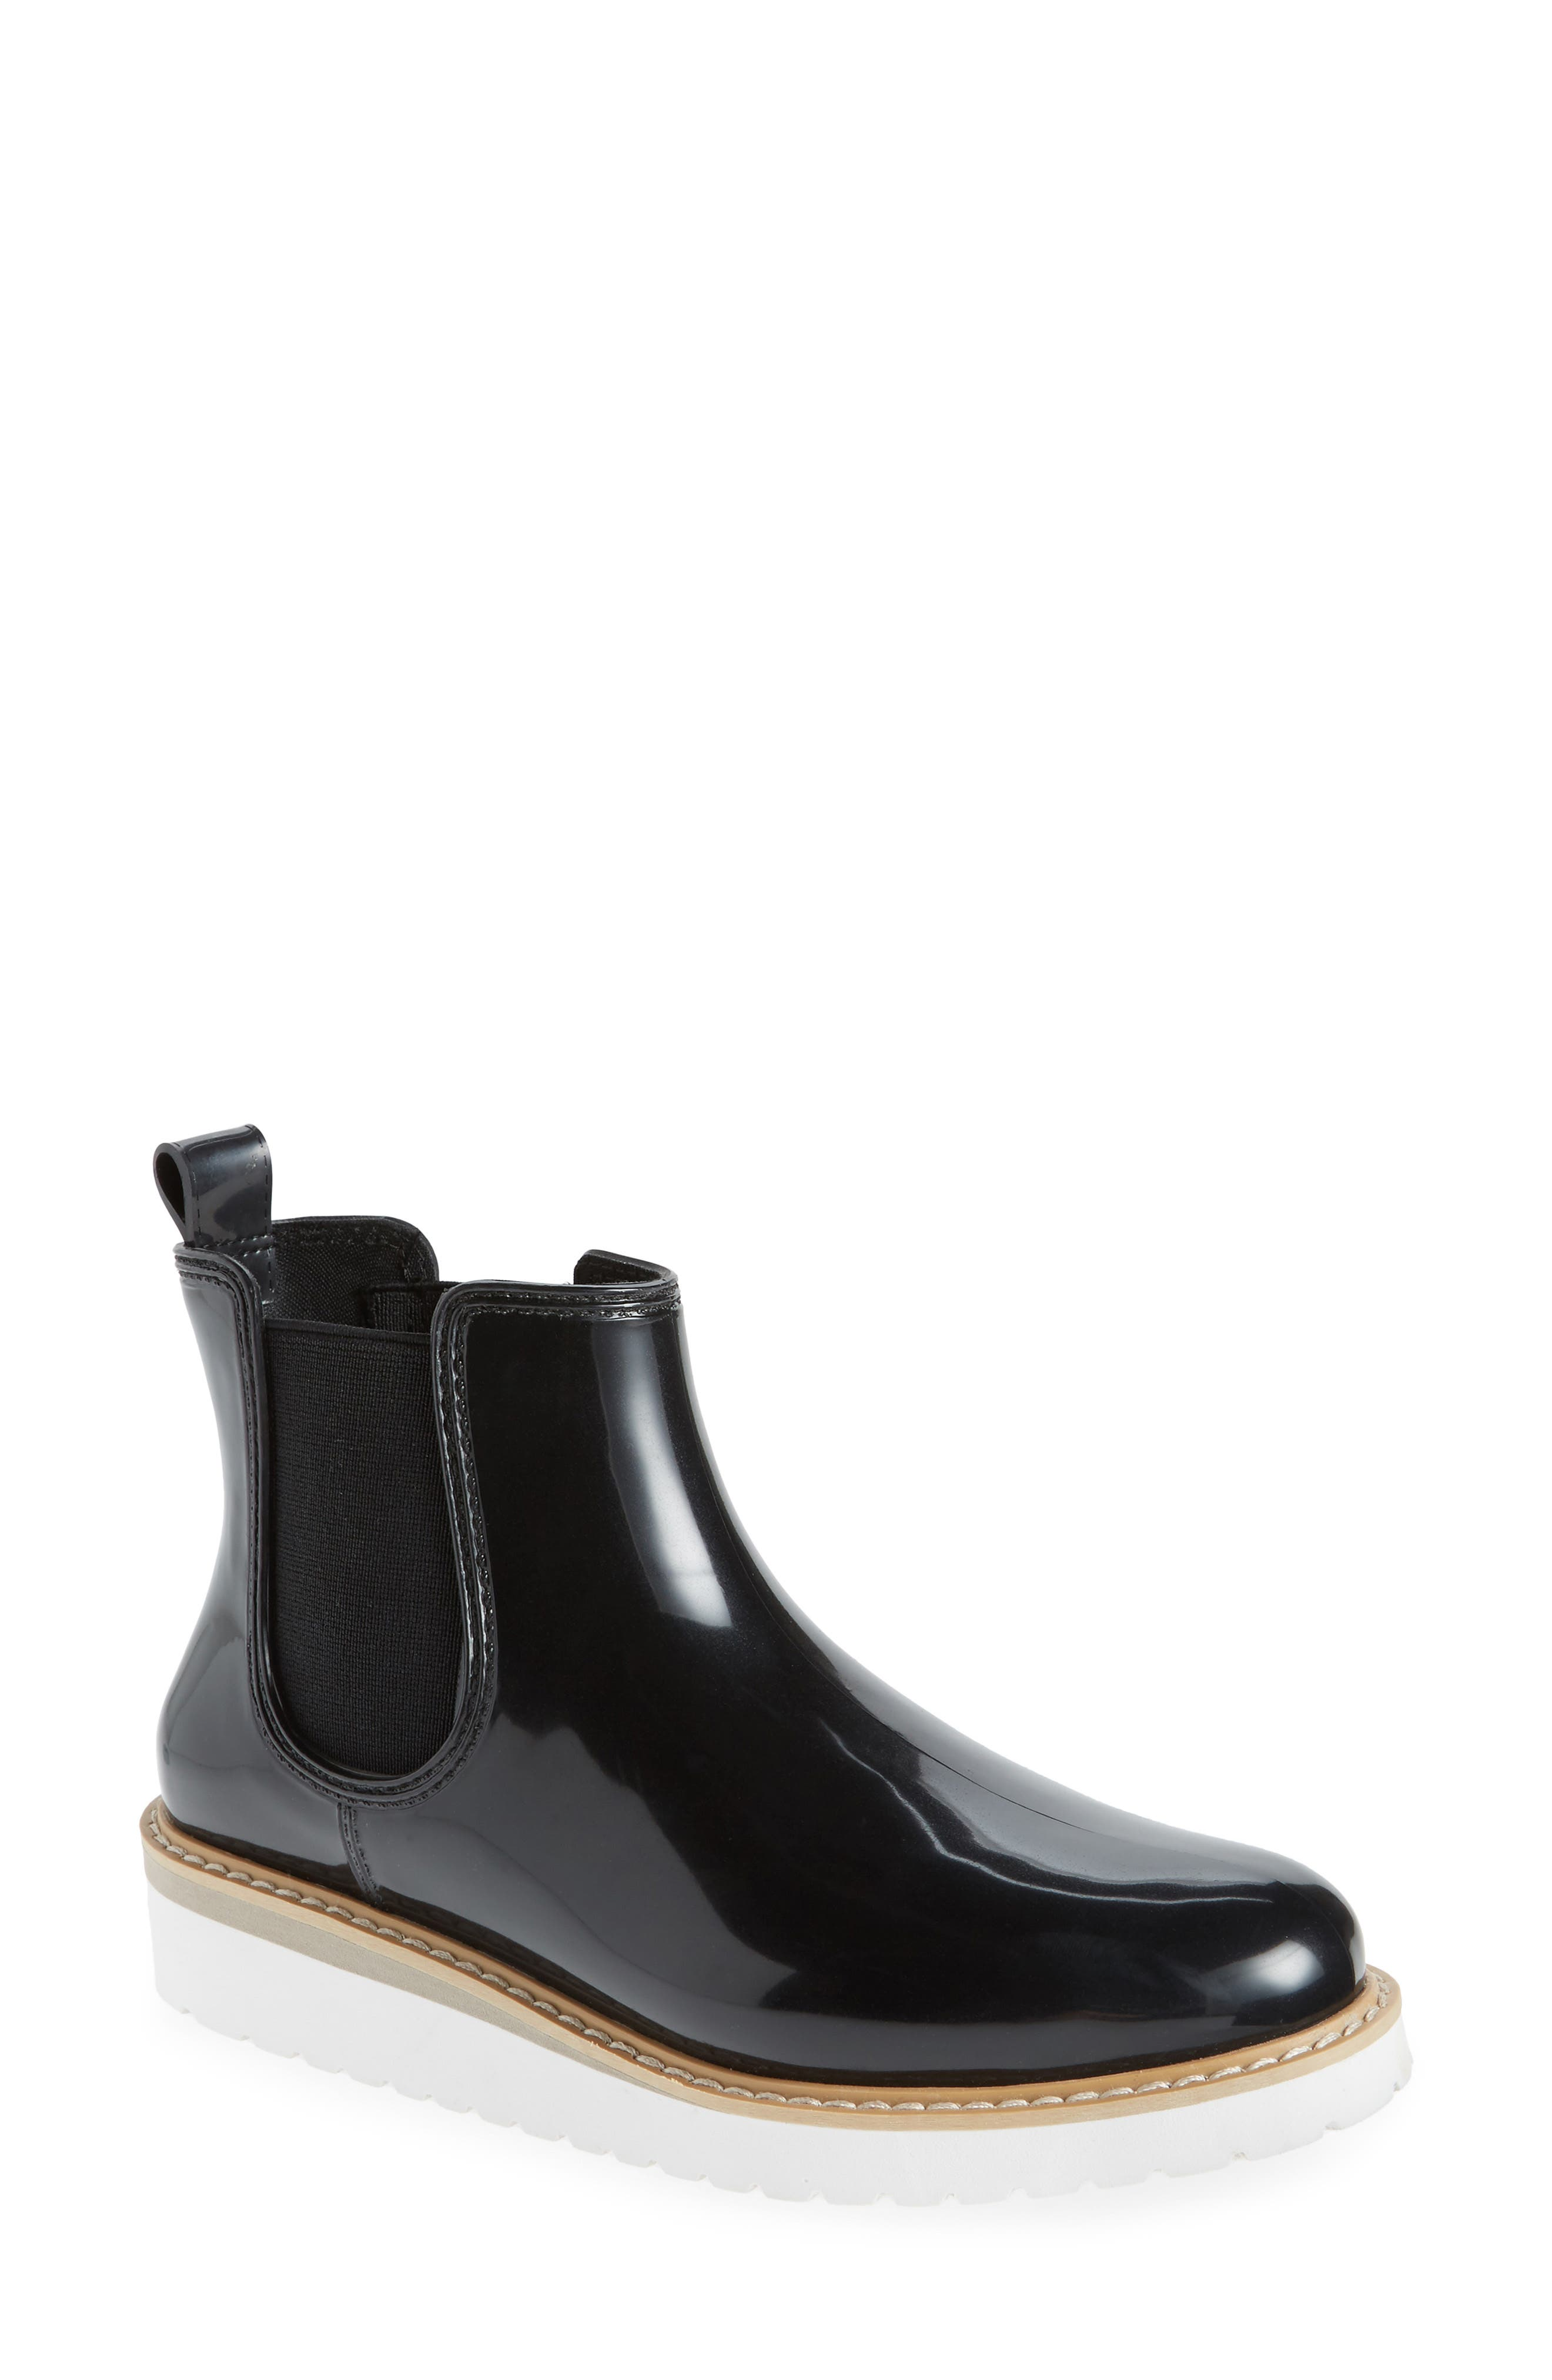 Kensington Chelsea Rain Boot,                             Main thumbnail 1, color,                             BLACK/ WHITE